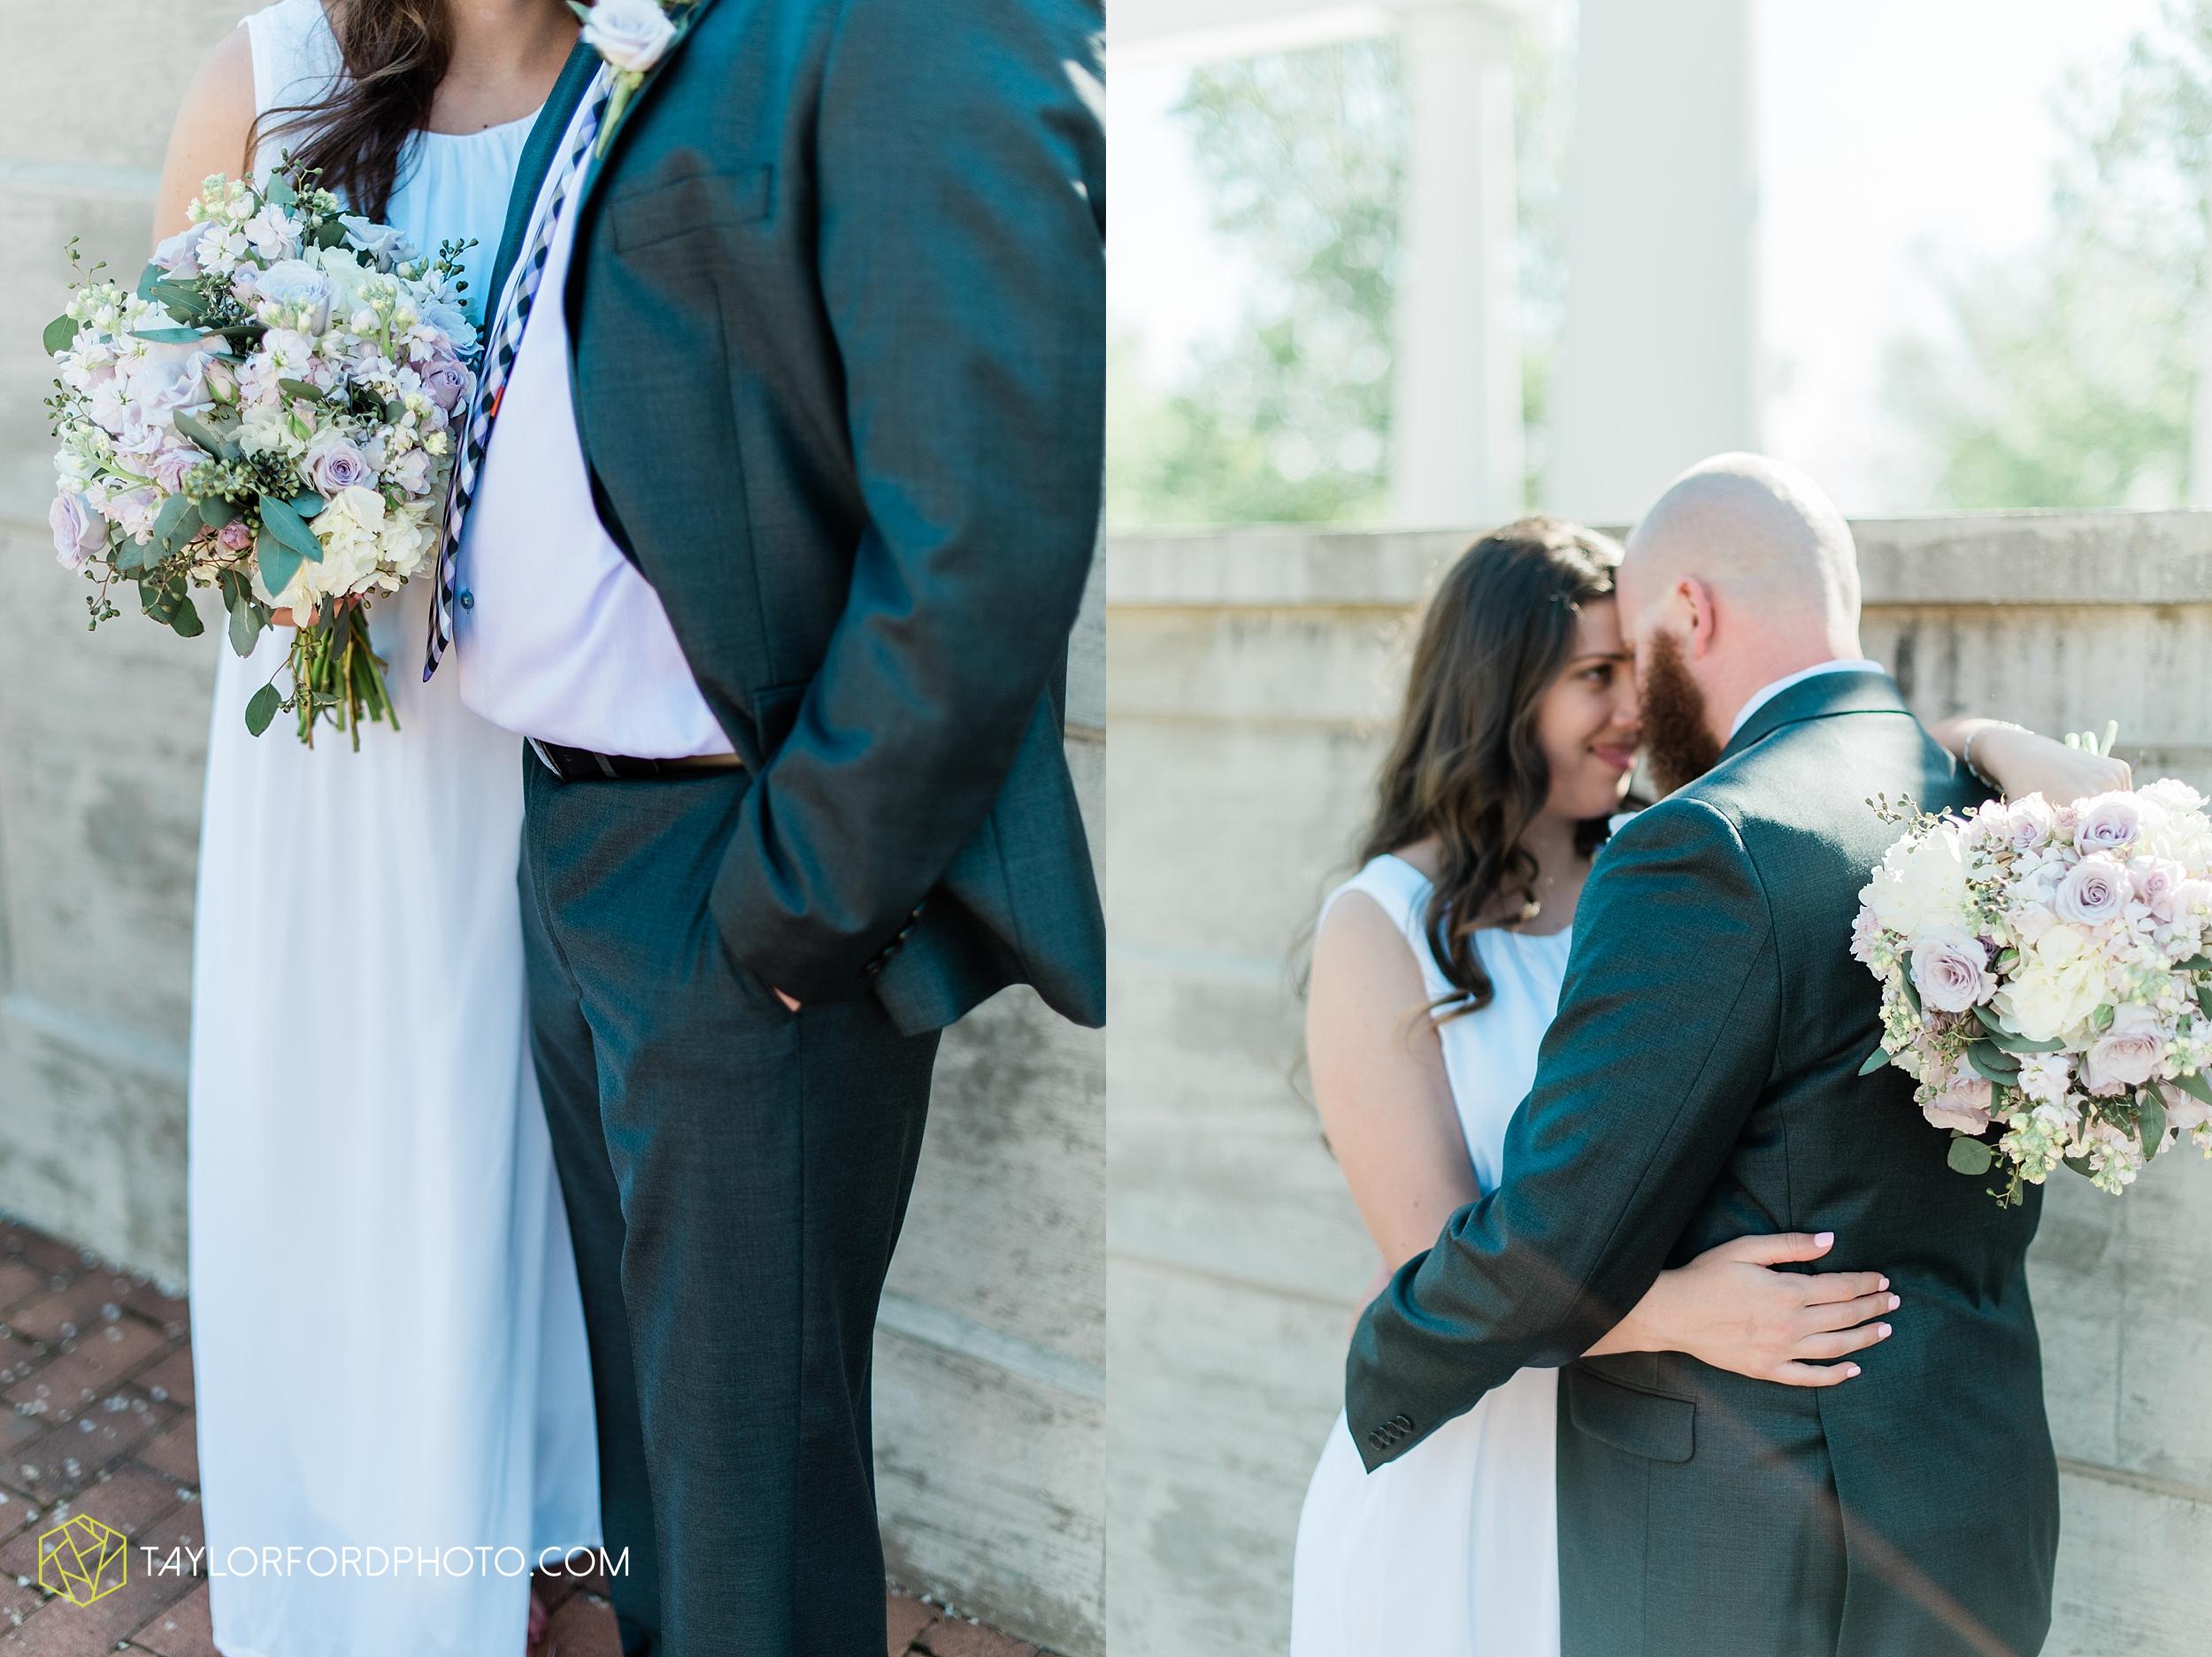 lakeside-rose-gardens-fort-wayne-indiana-elopement-wedding-photographer-Taylor-Ford-Photography_7158.jpg